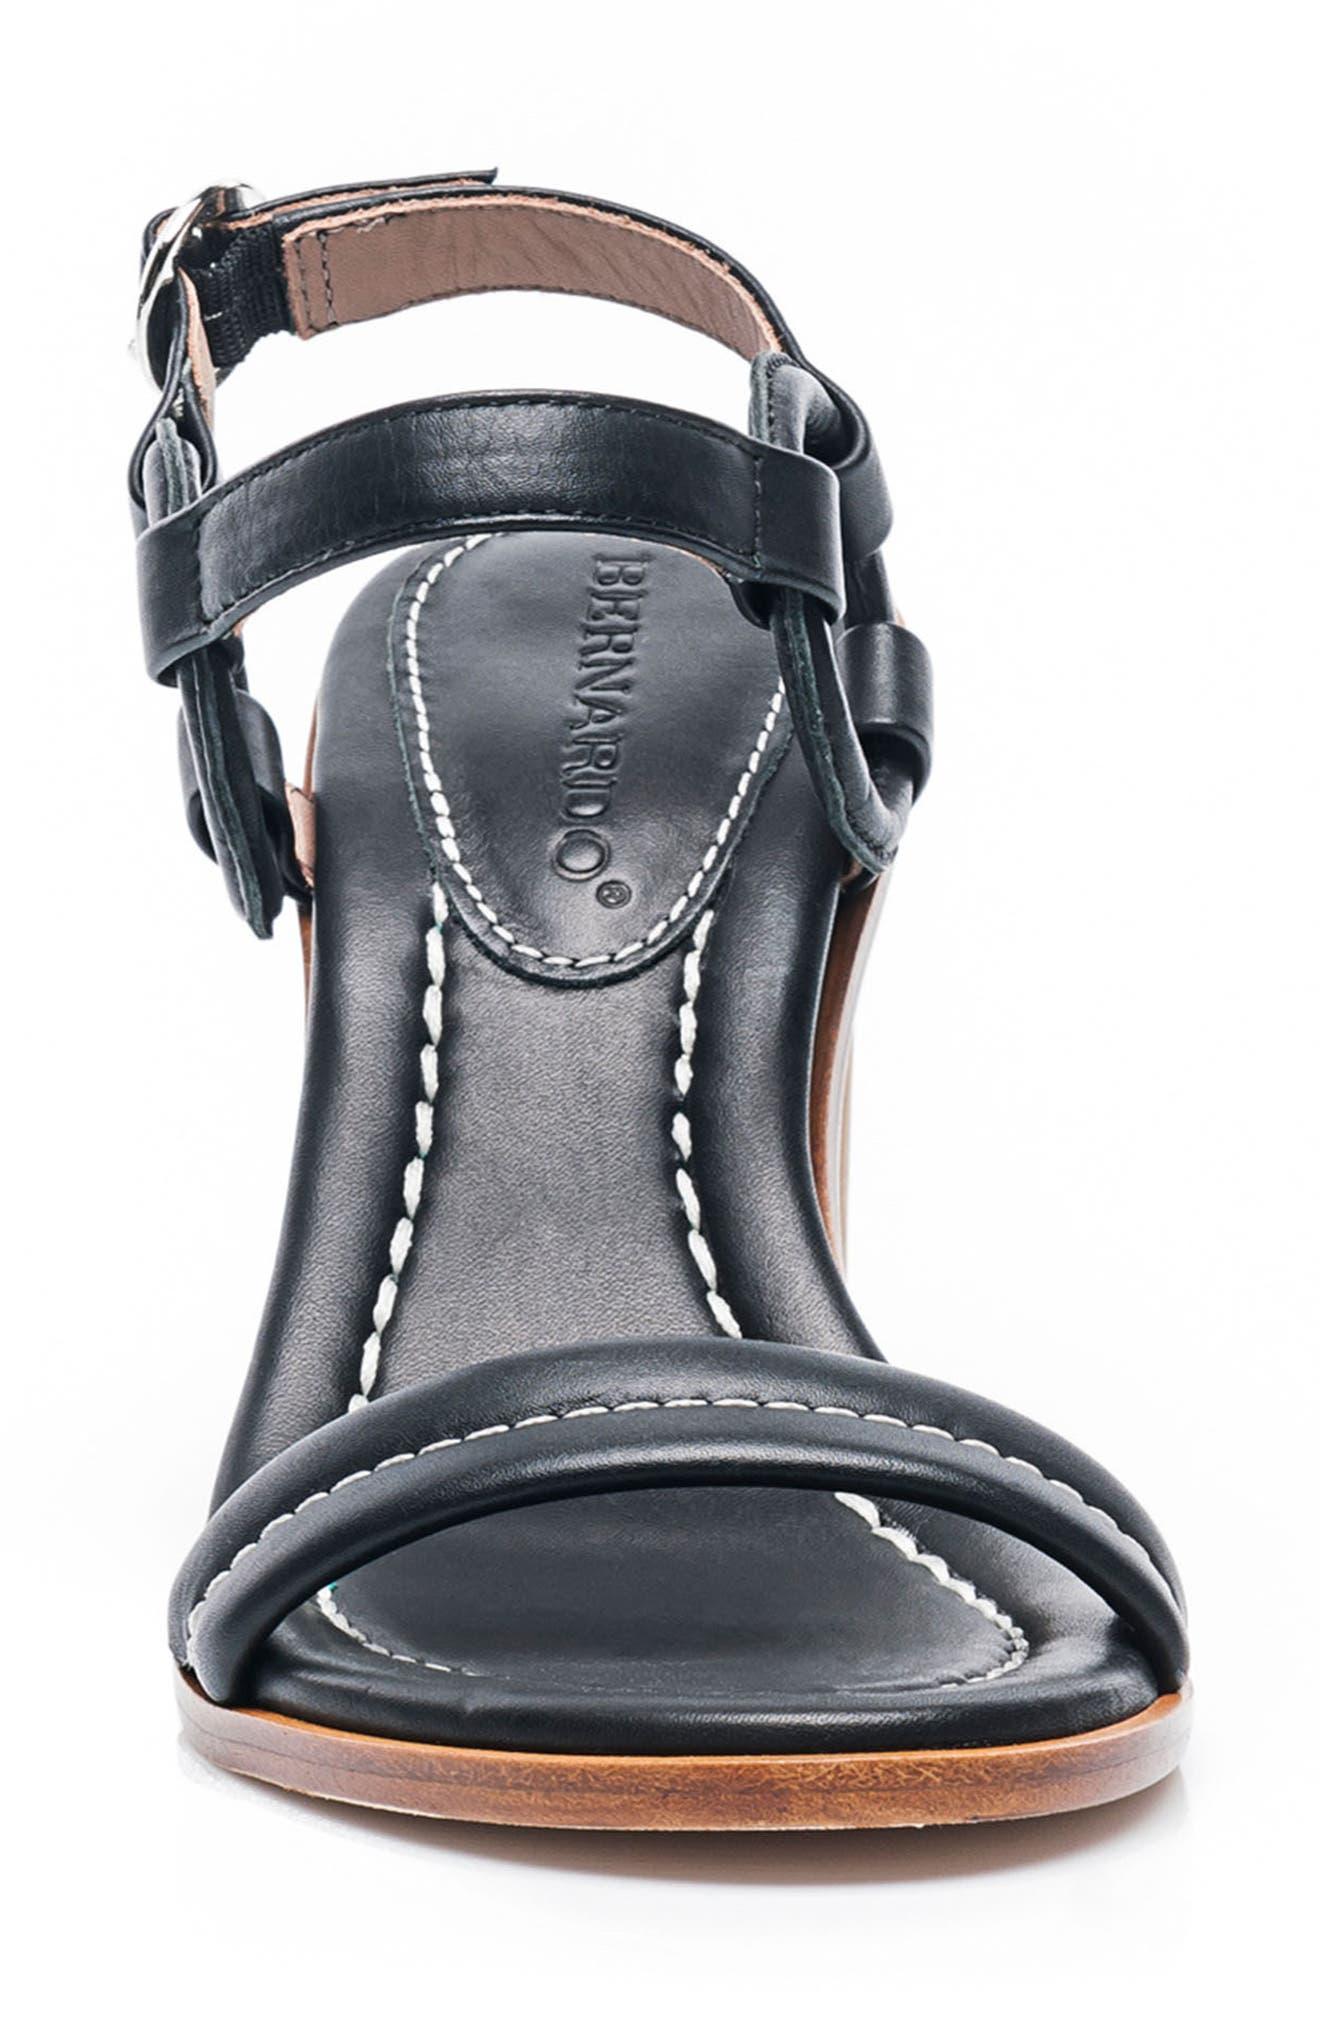 BERNARDO, Harlow Ankle Strap Sandal, Alternate thumbnail 4, color, BLACK LEATHER